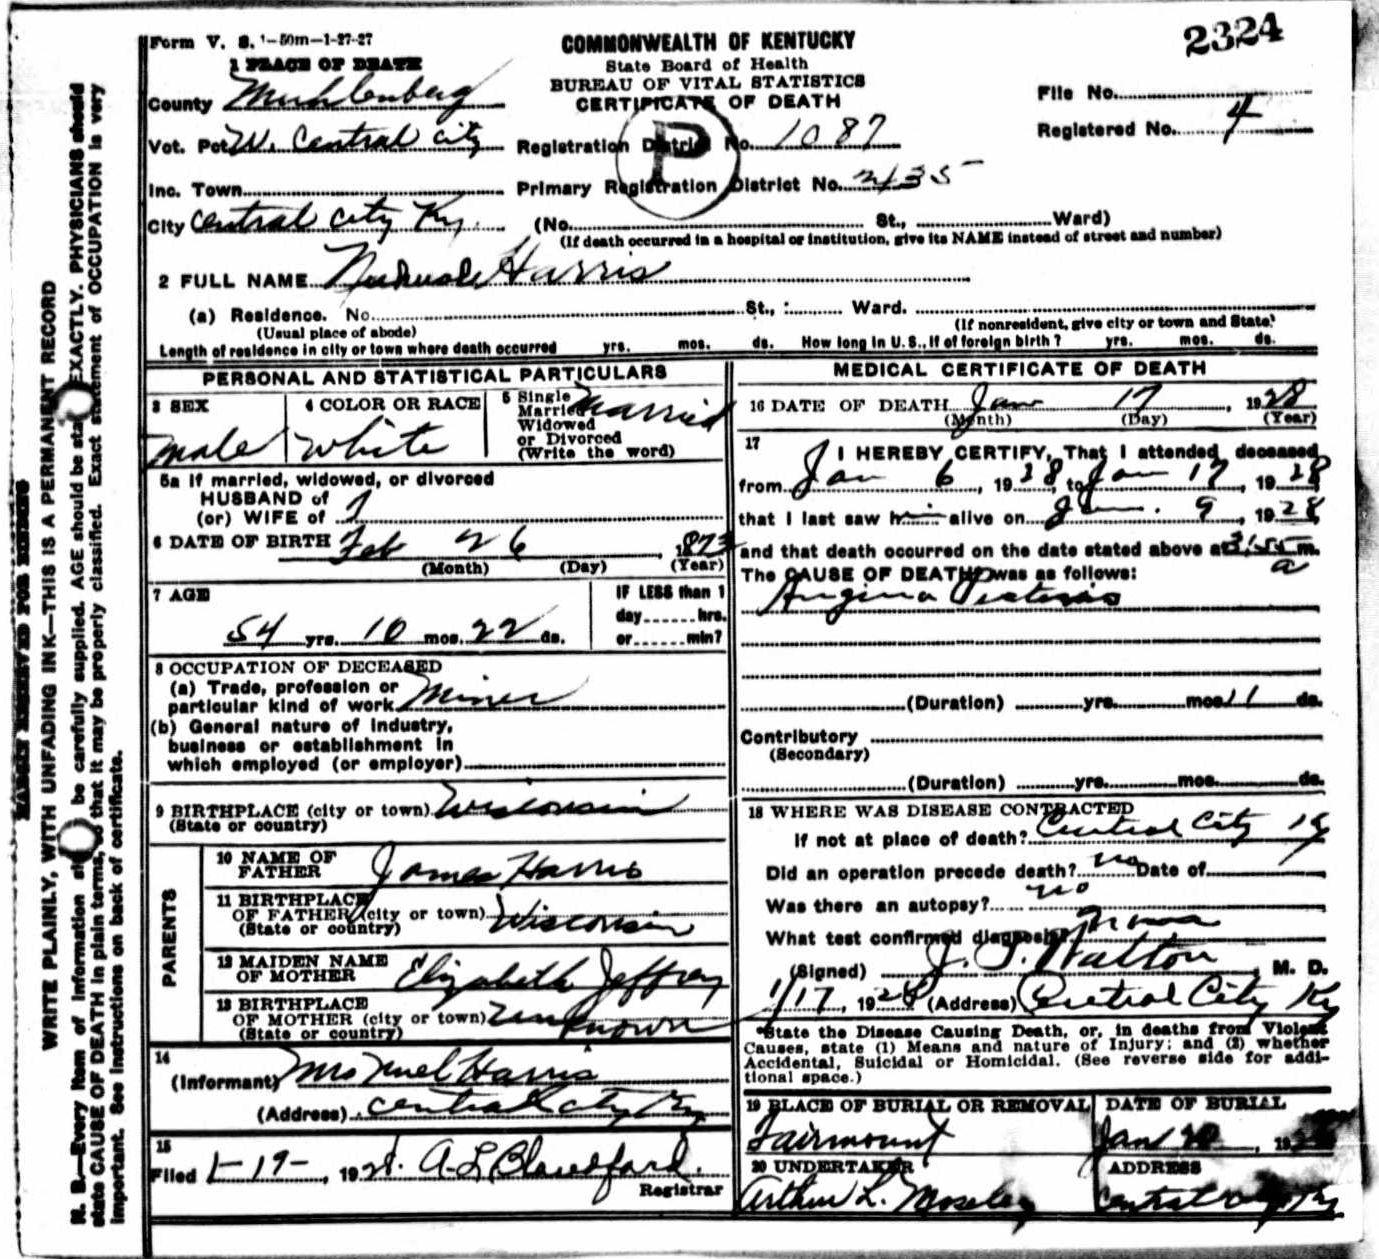 Death certificates h kentucky death certificate 2324 1betcityfo Gallery